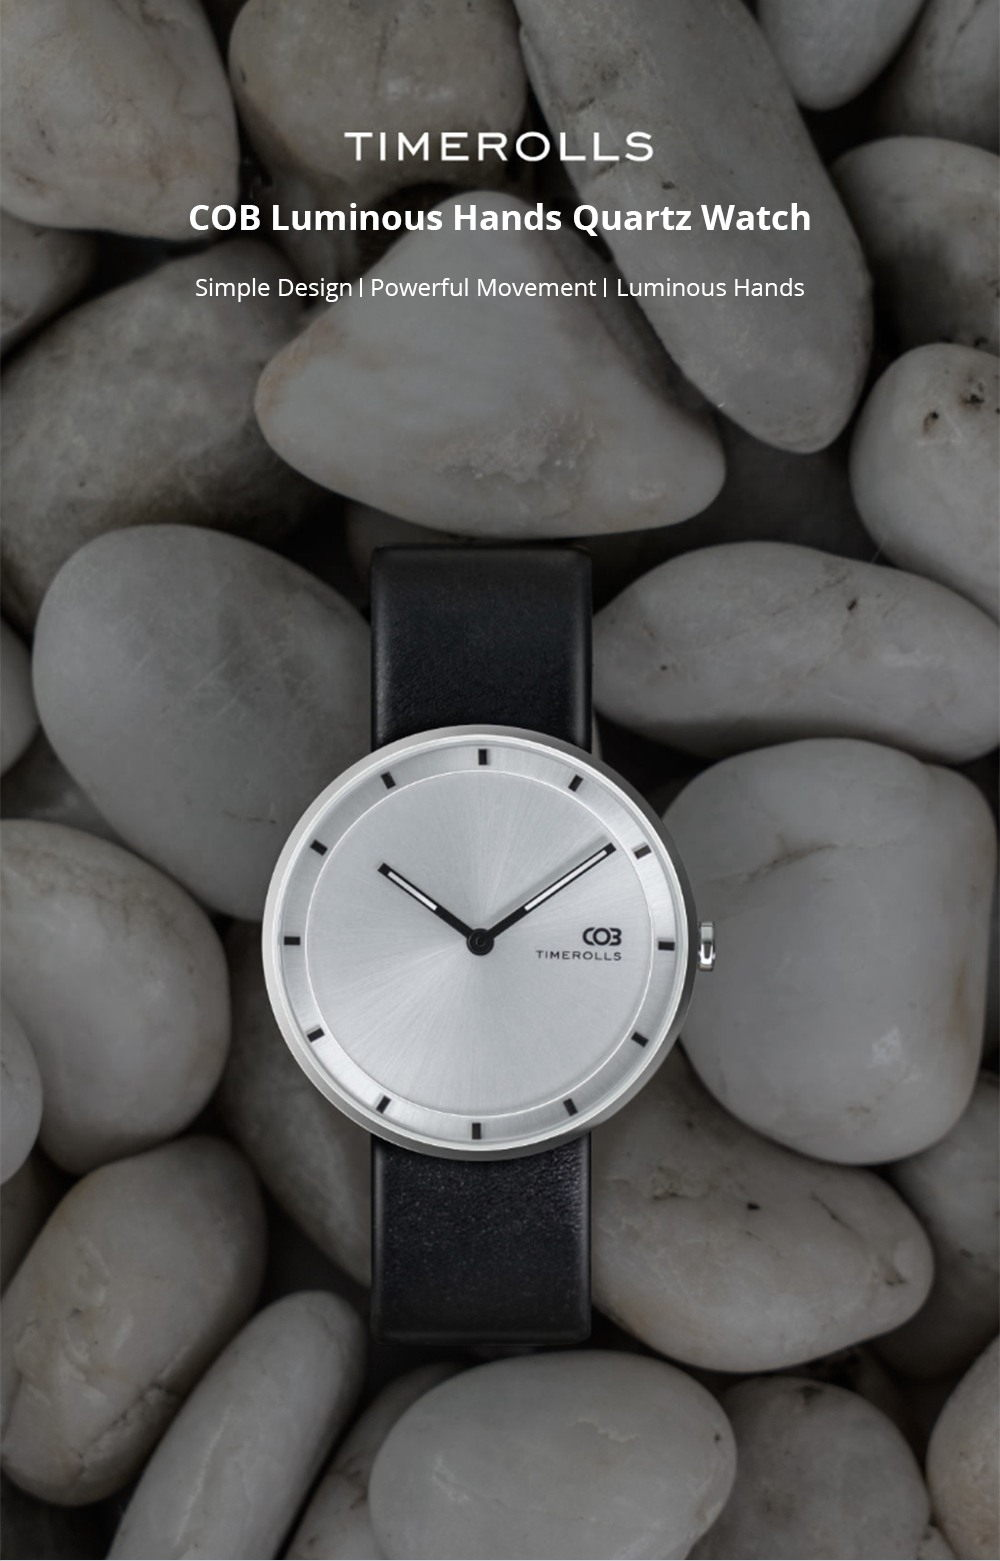 Xiaomi Youpin TIMEROLLS COB Quartz Watch.jpg